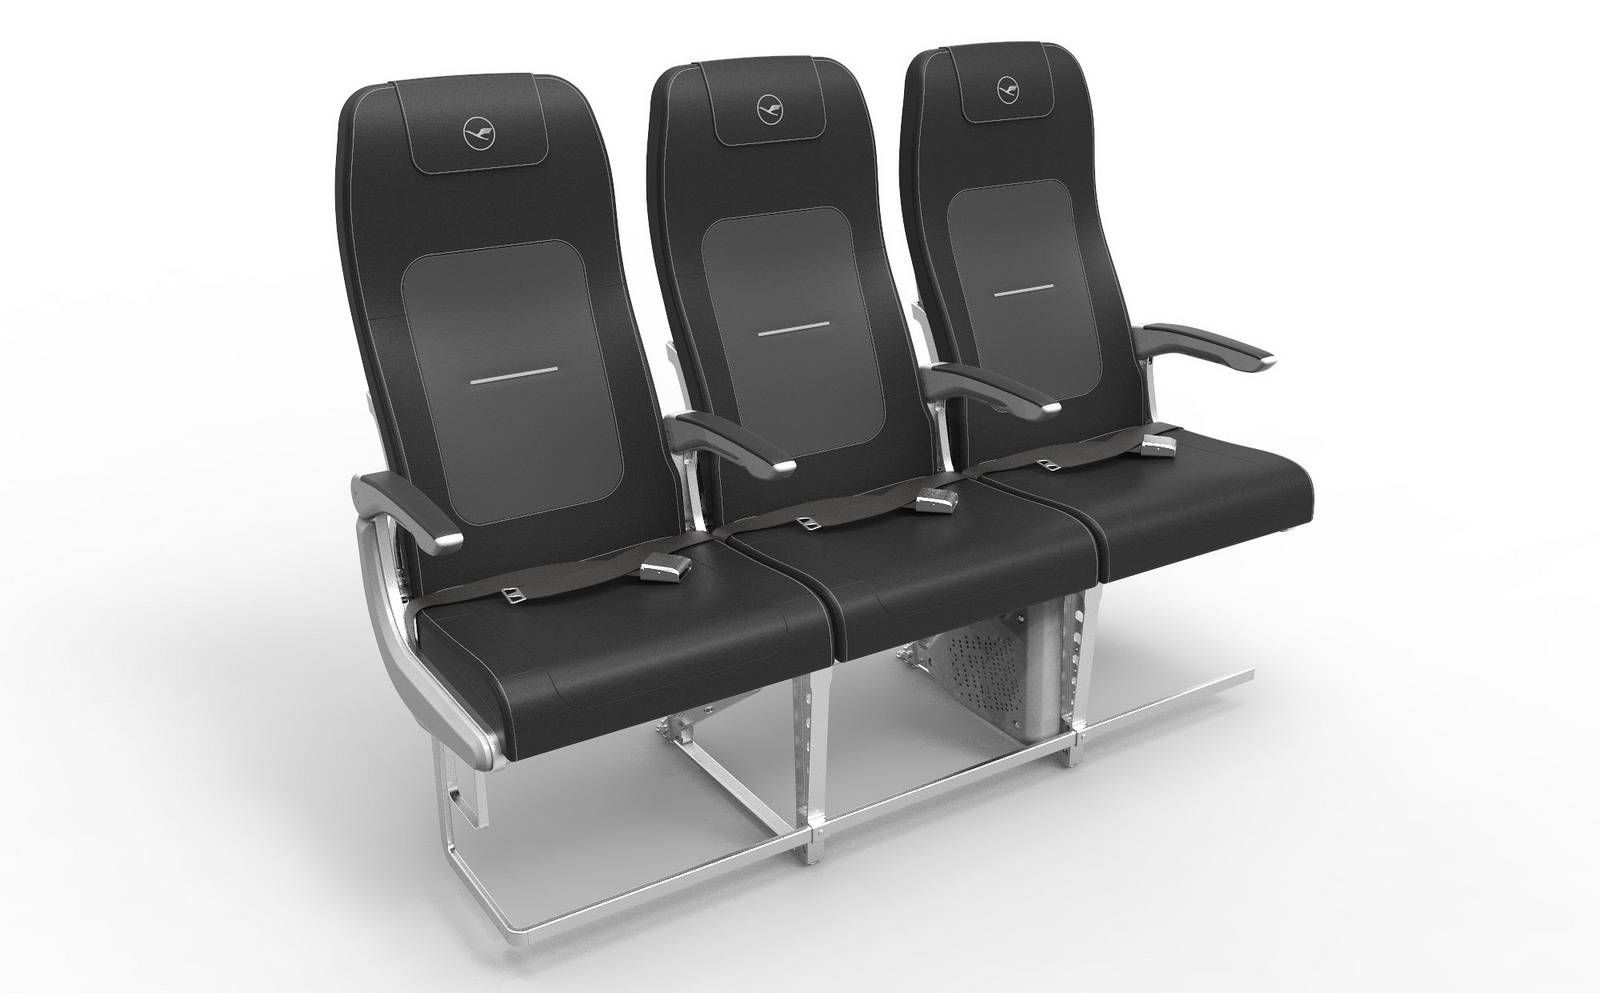 Lufthansa Group apresenta novo assento para a família de aeronaves Airbus A320